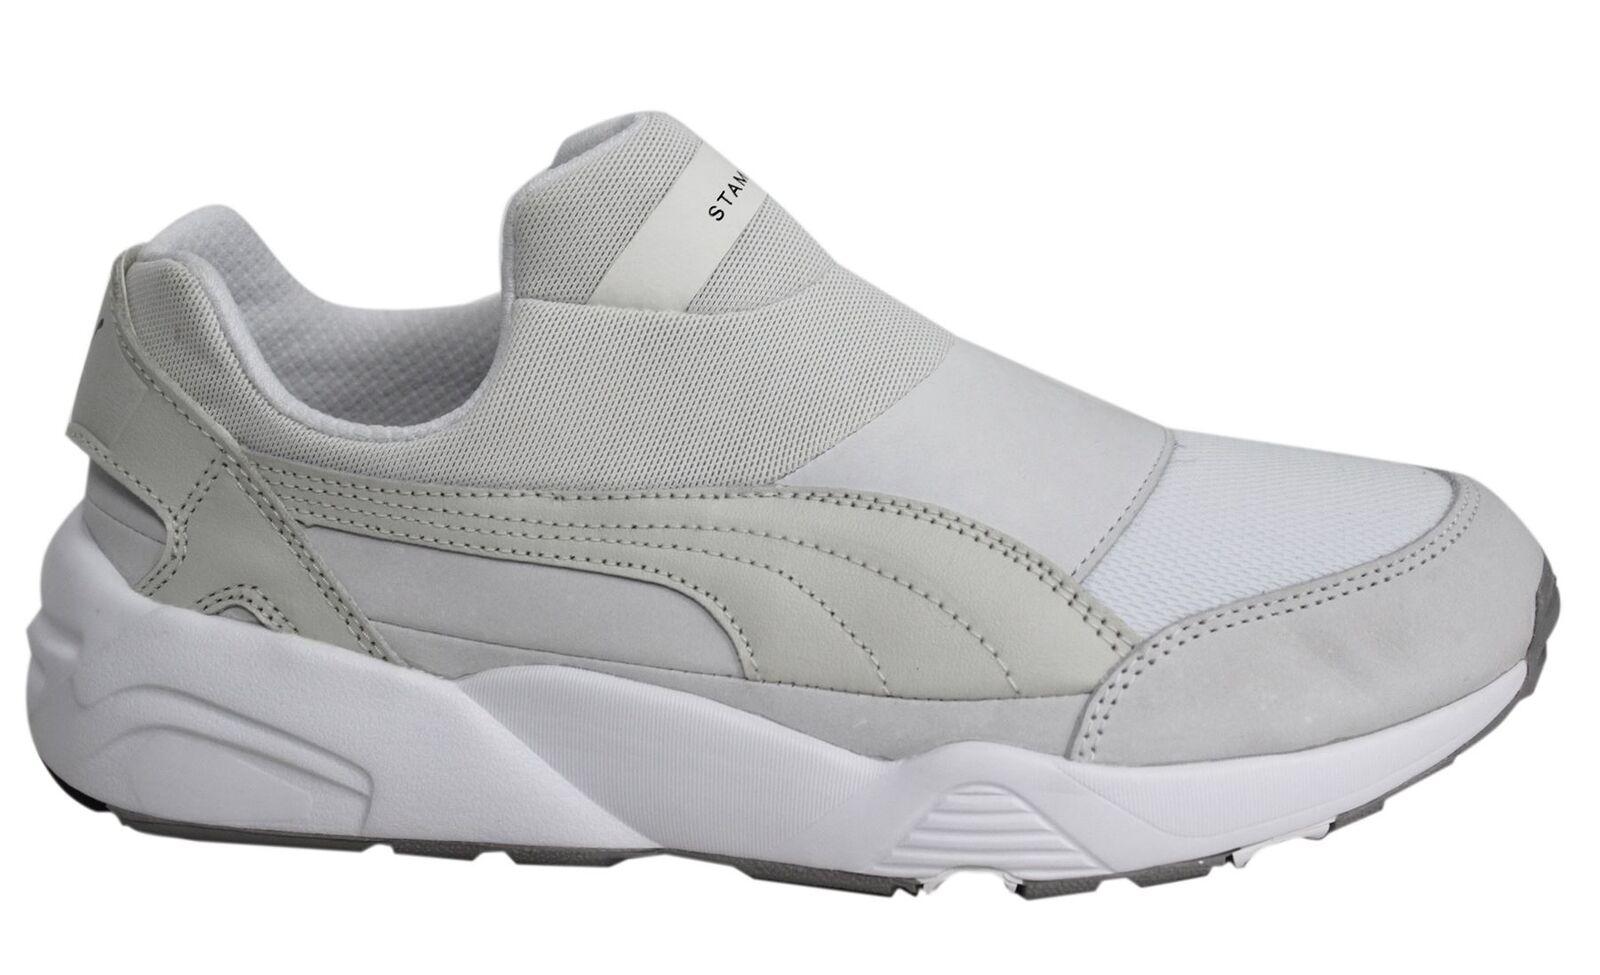 Puma Trinomic Sock Stampd NM Weiß x  Uomo Off Weiß NM Trainers Slip On Schuhe 361429 03 D9 94bff4